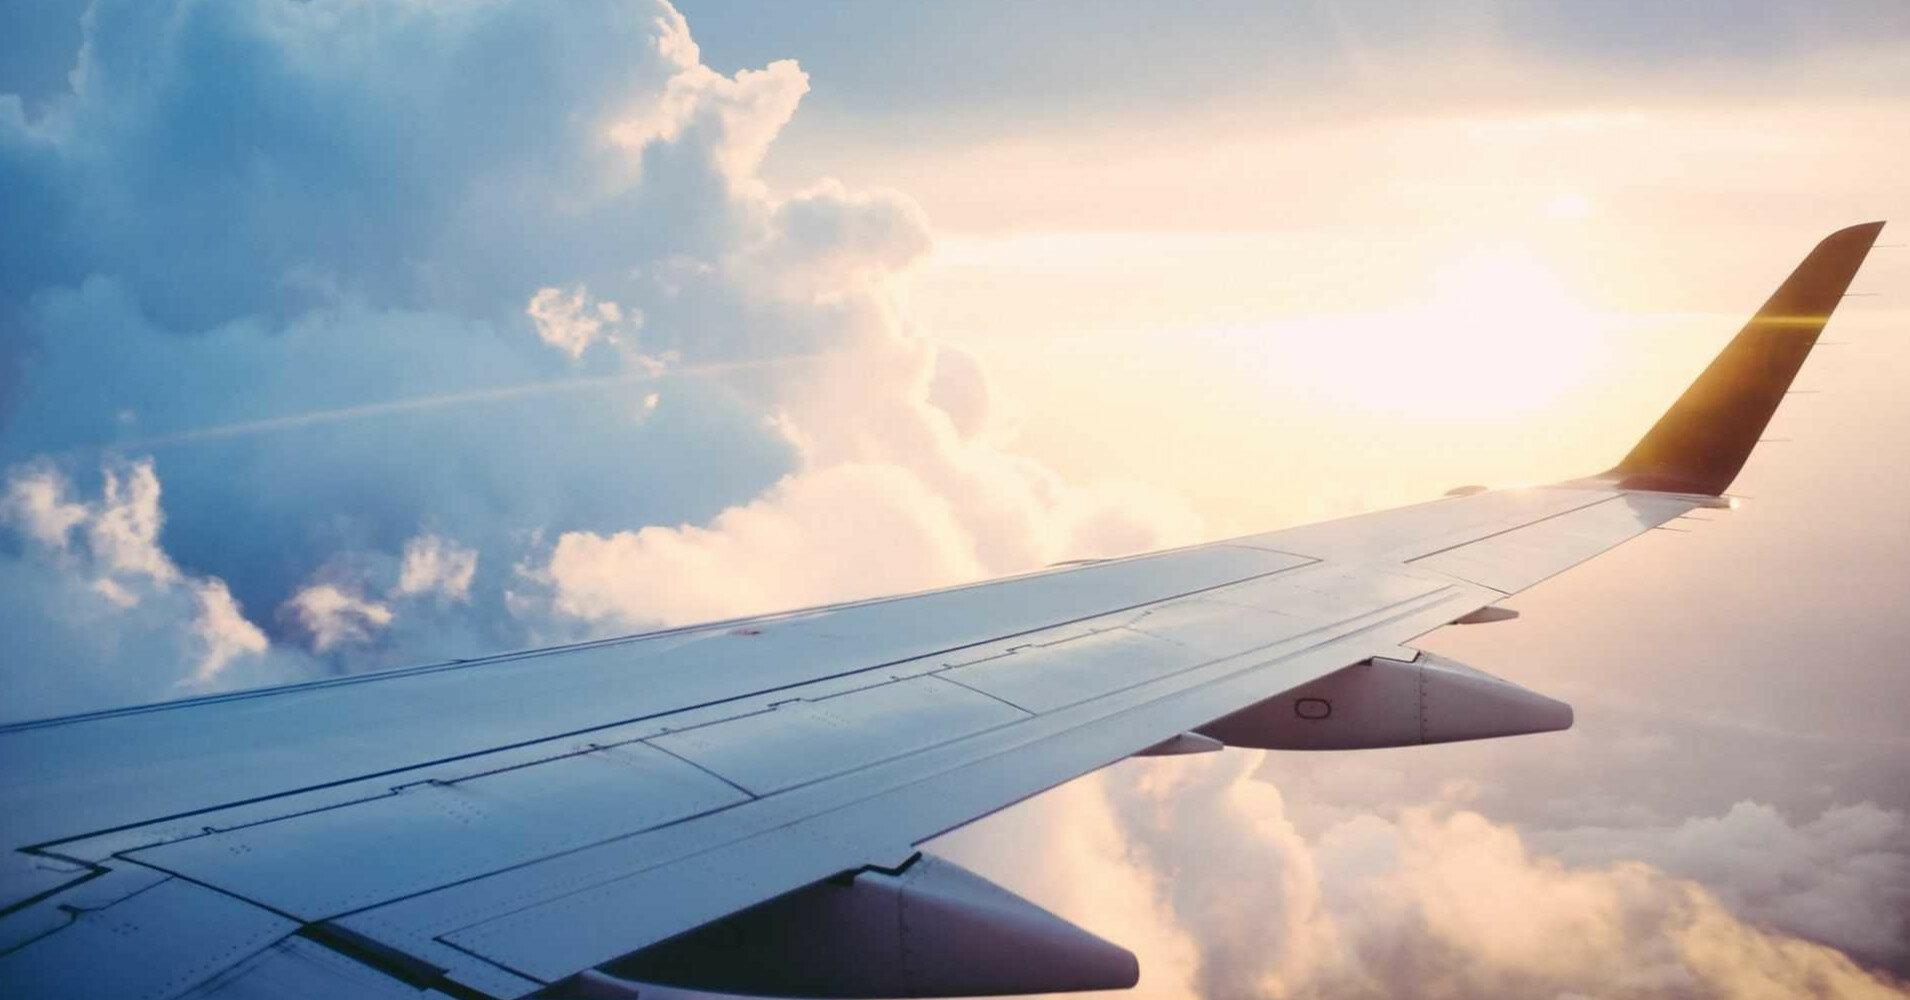 Аэропорт Ярославского восстановил 84% докарантинного пассажиропотока